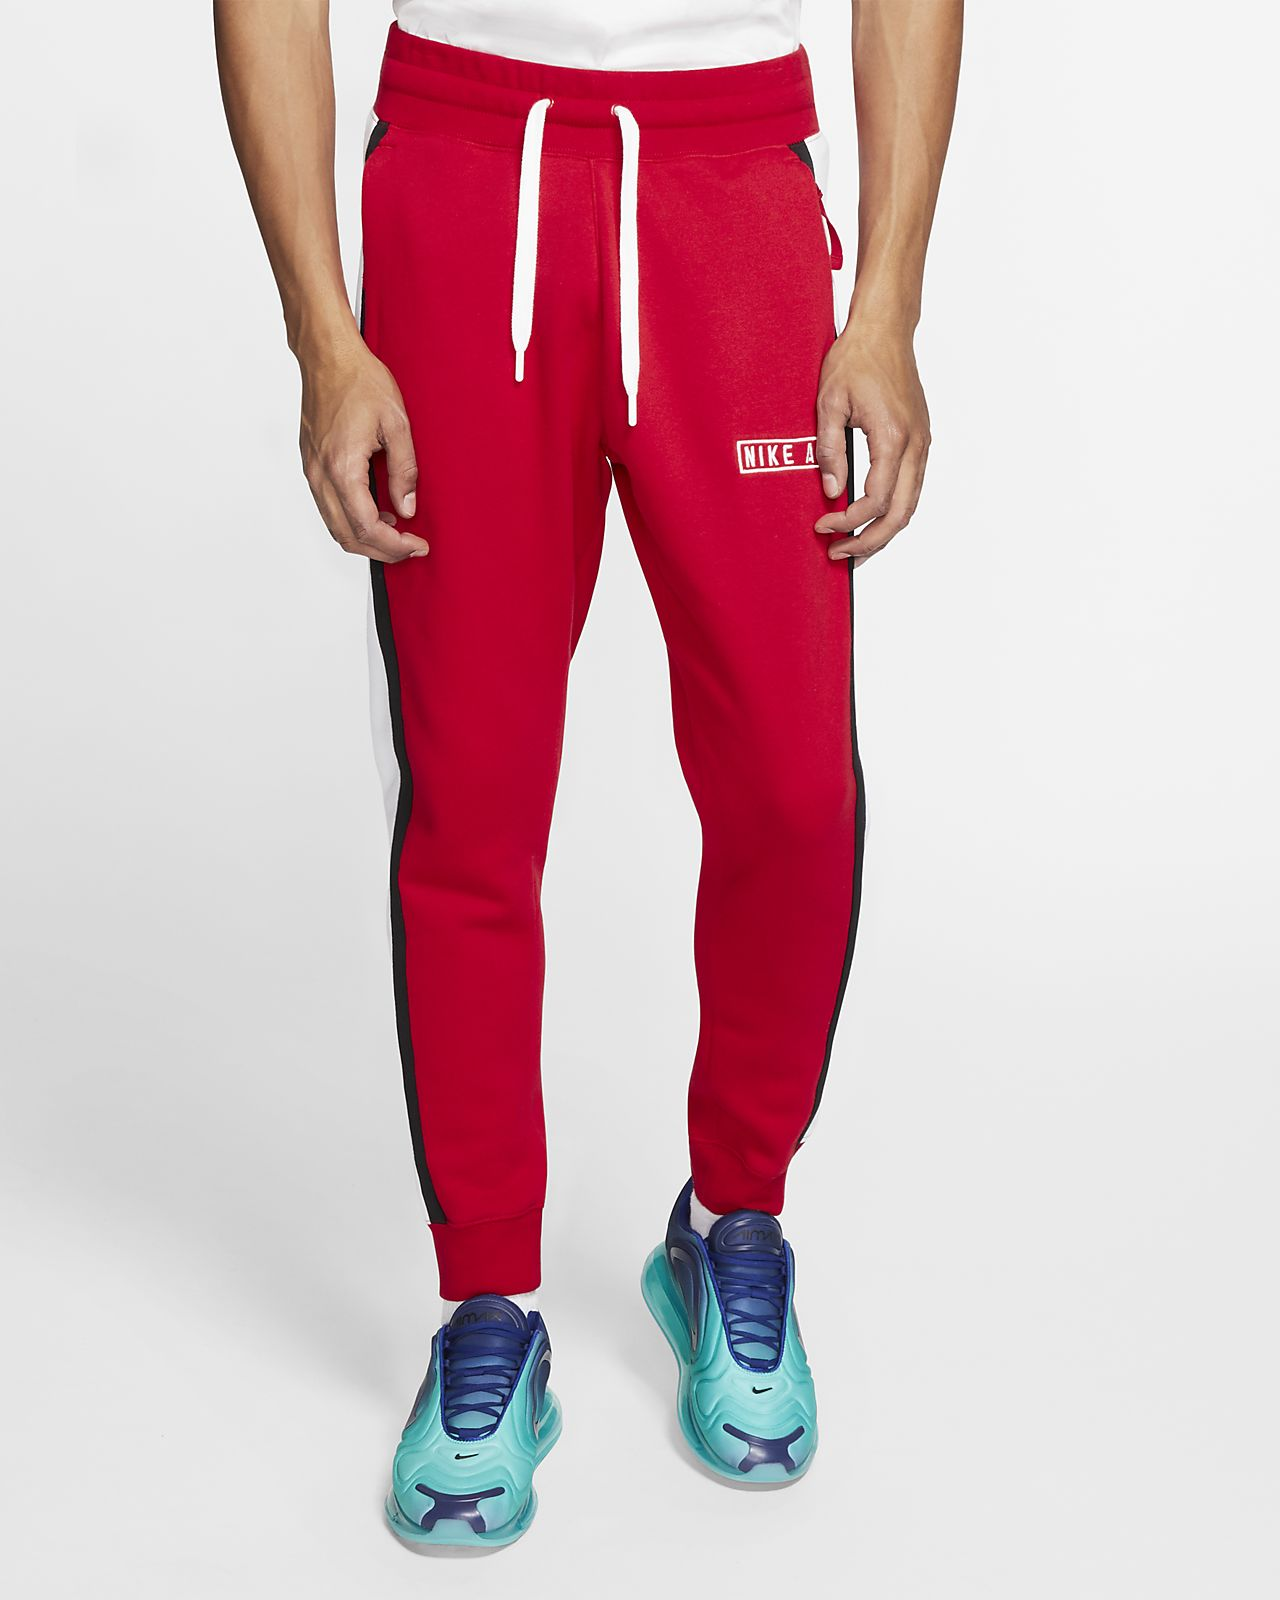 Nike Air Men's Fleece Trousers